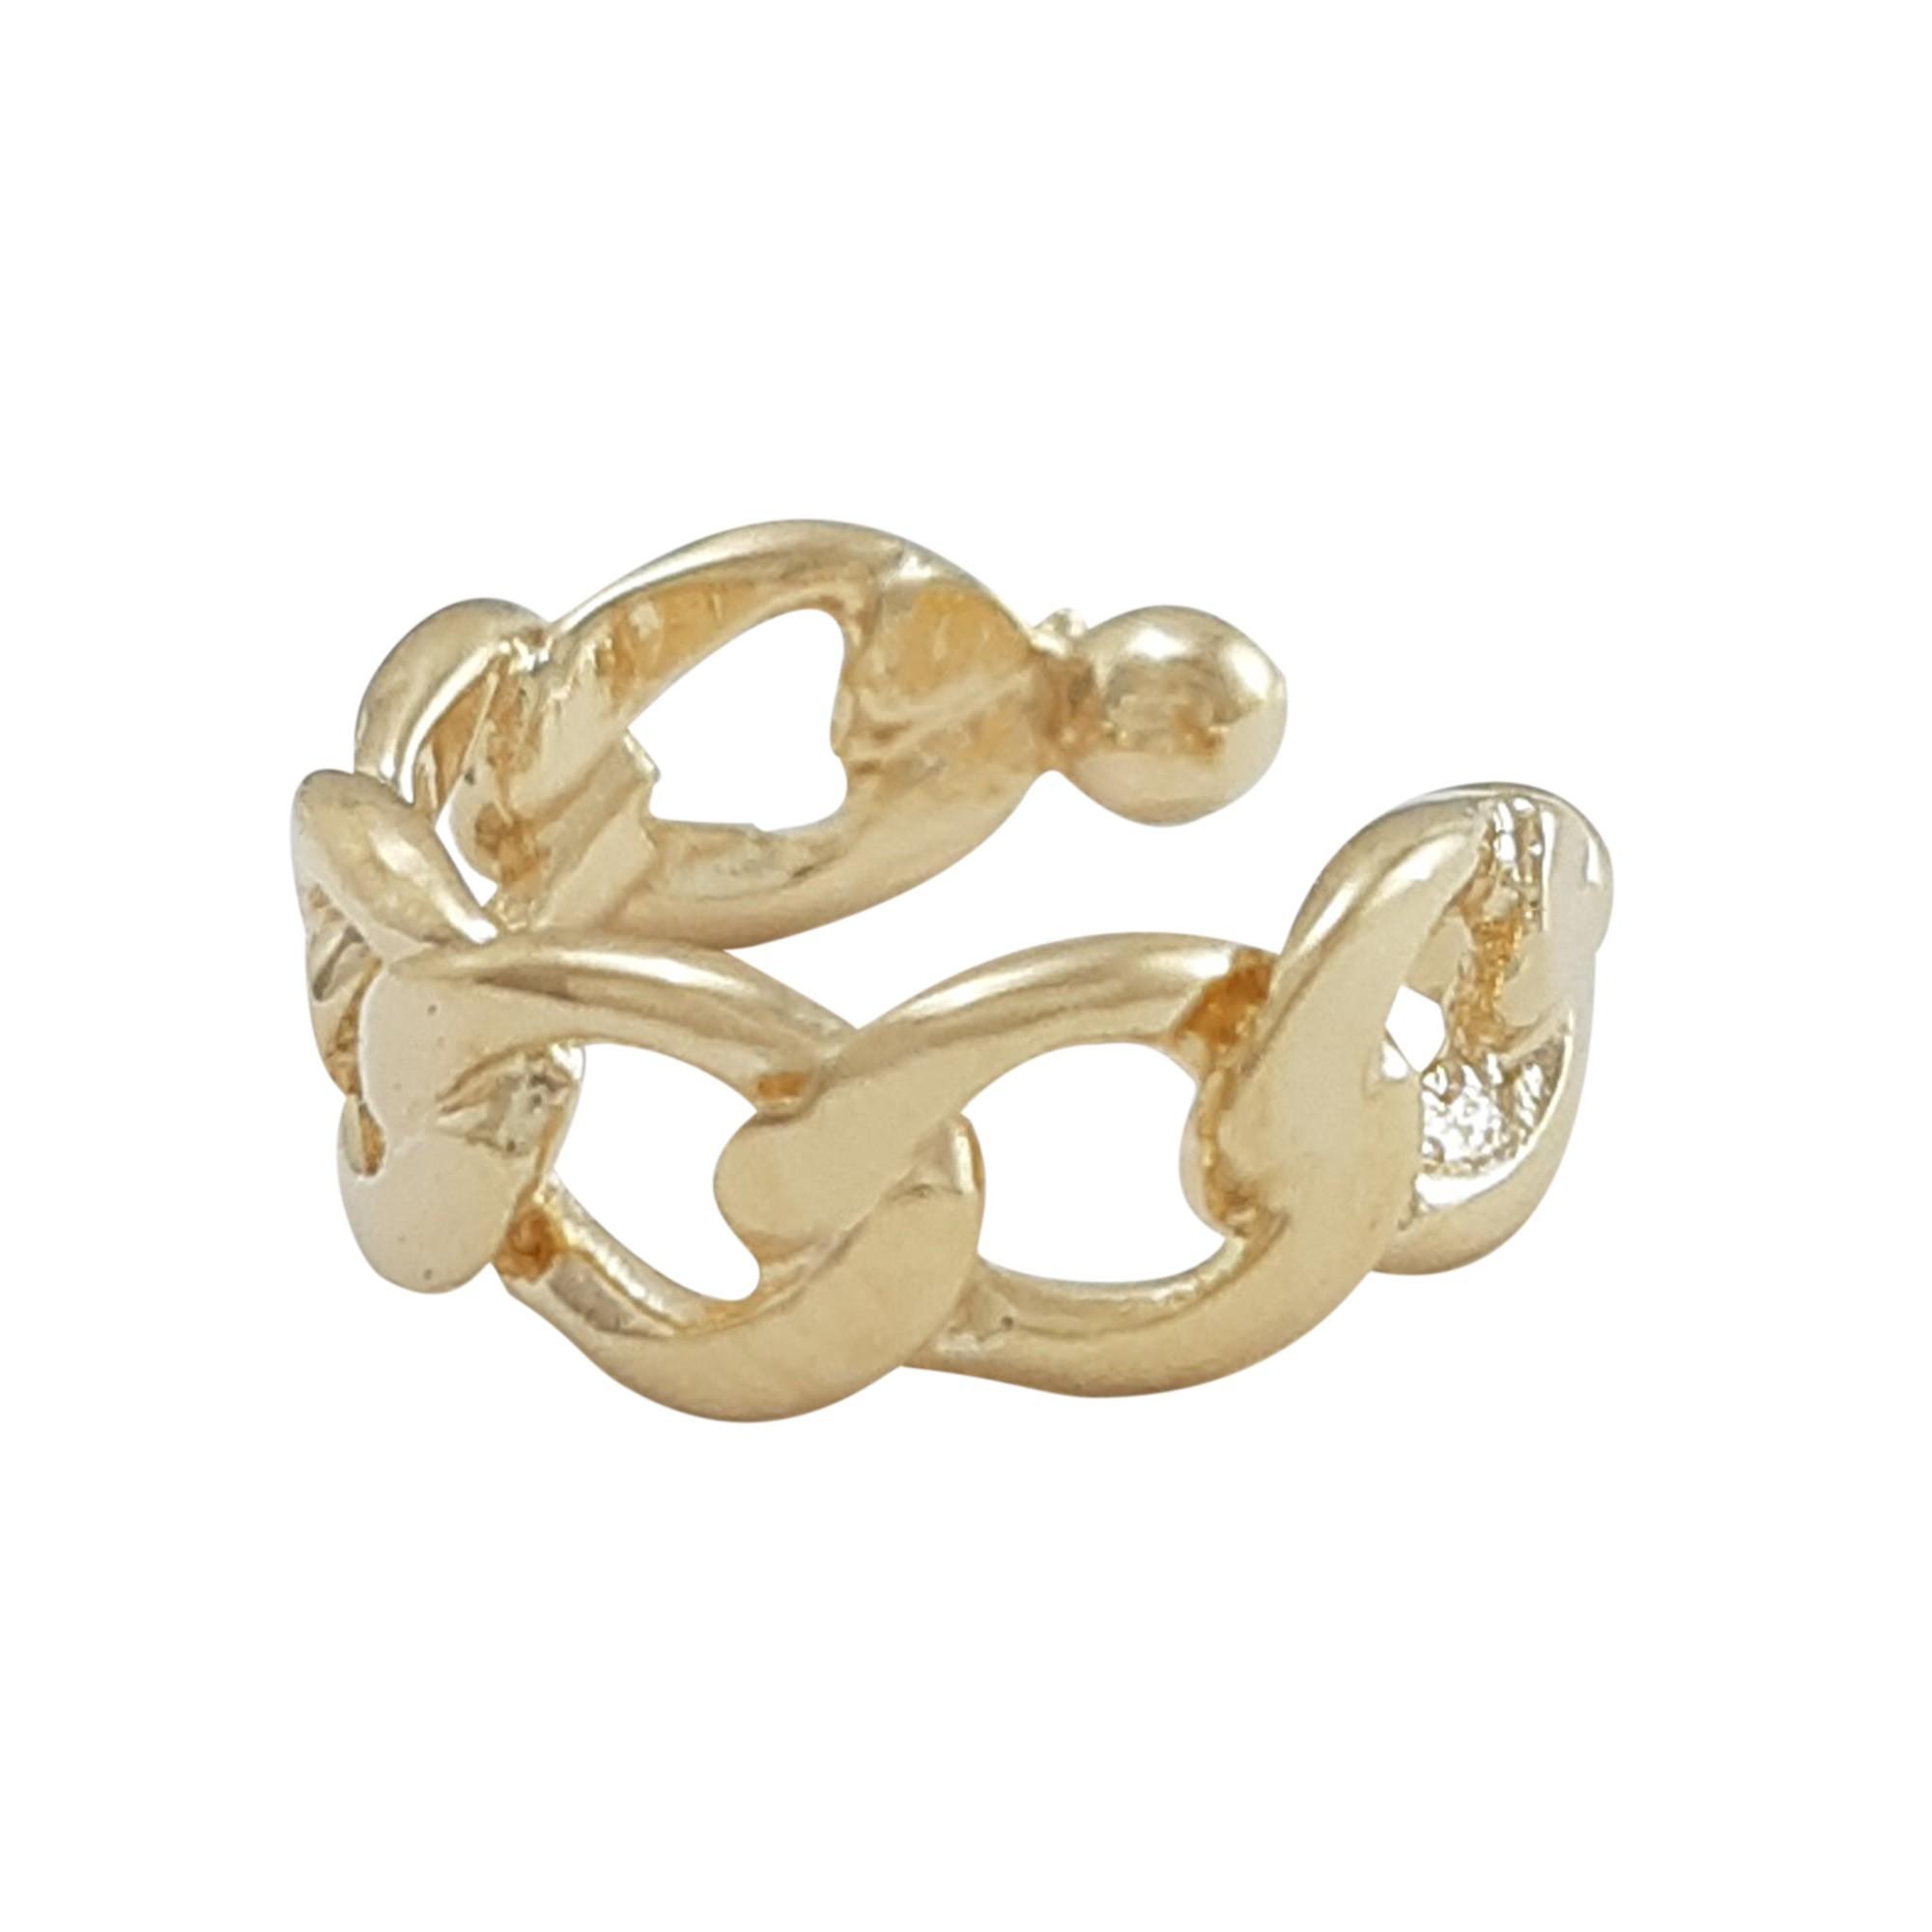 Piercing mini elos  banhado a ouro 18k